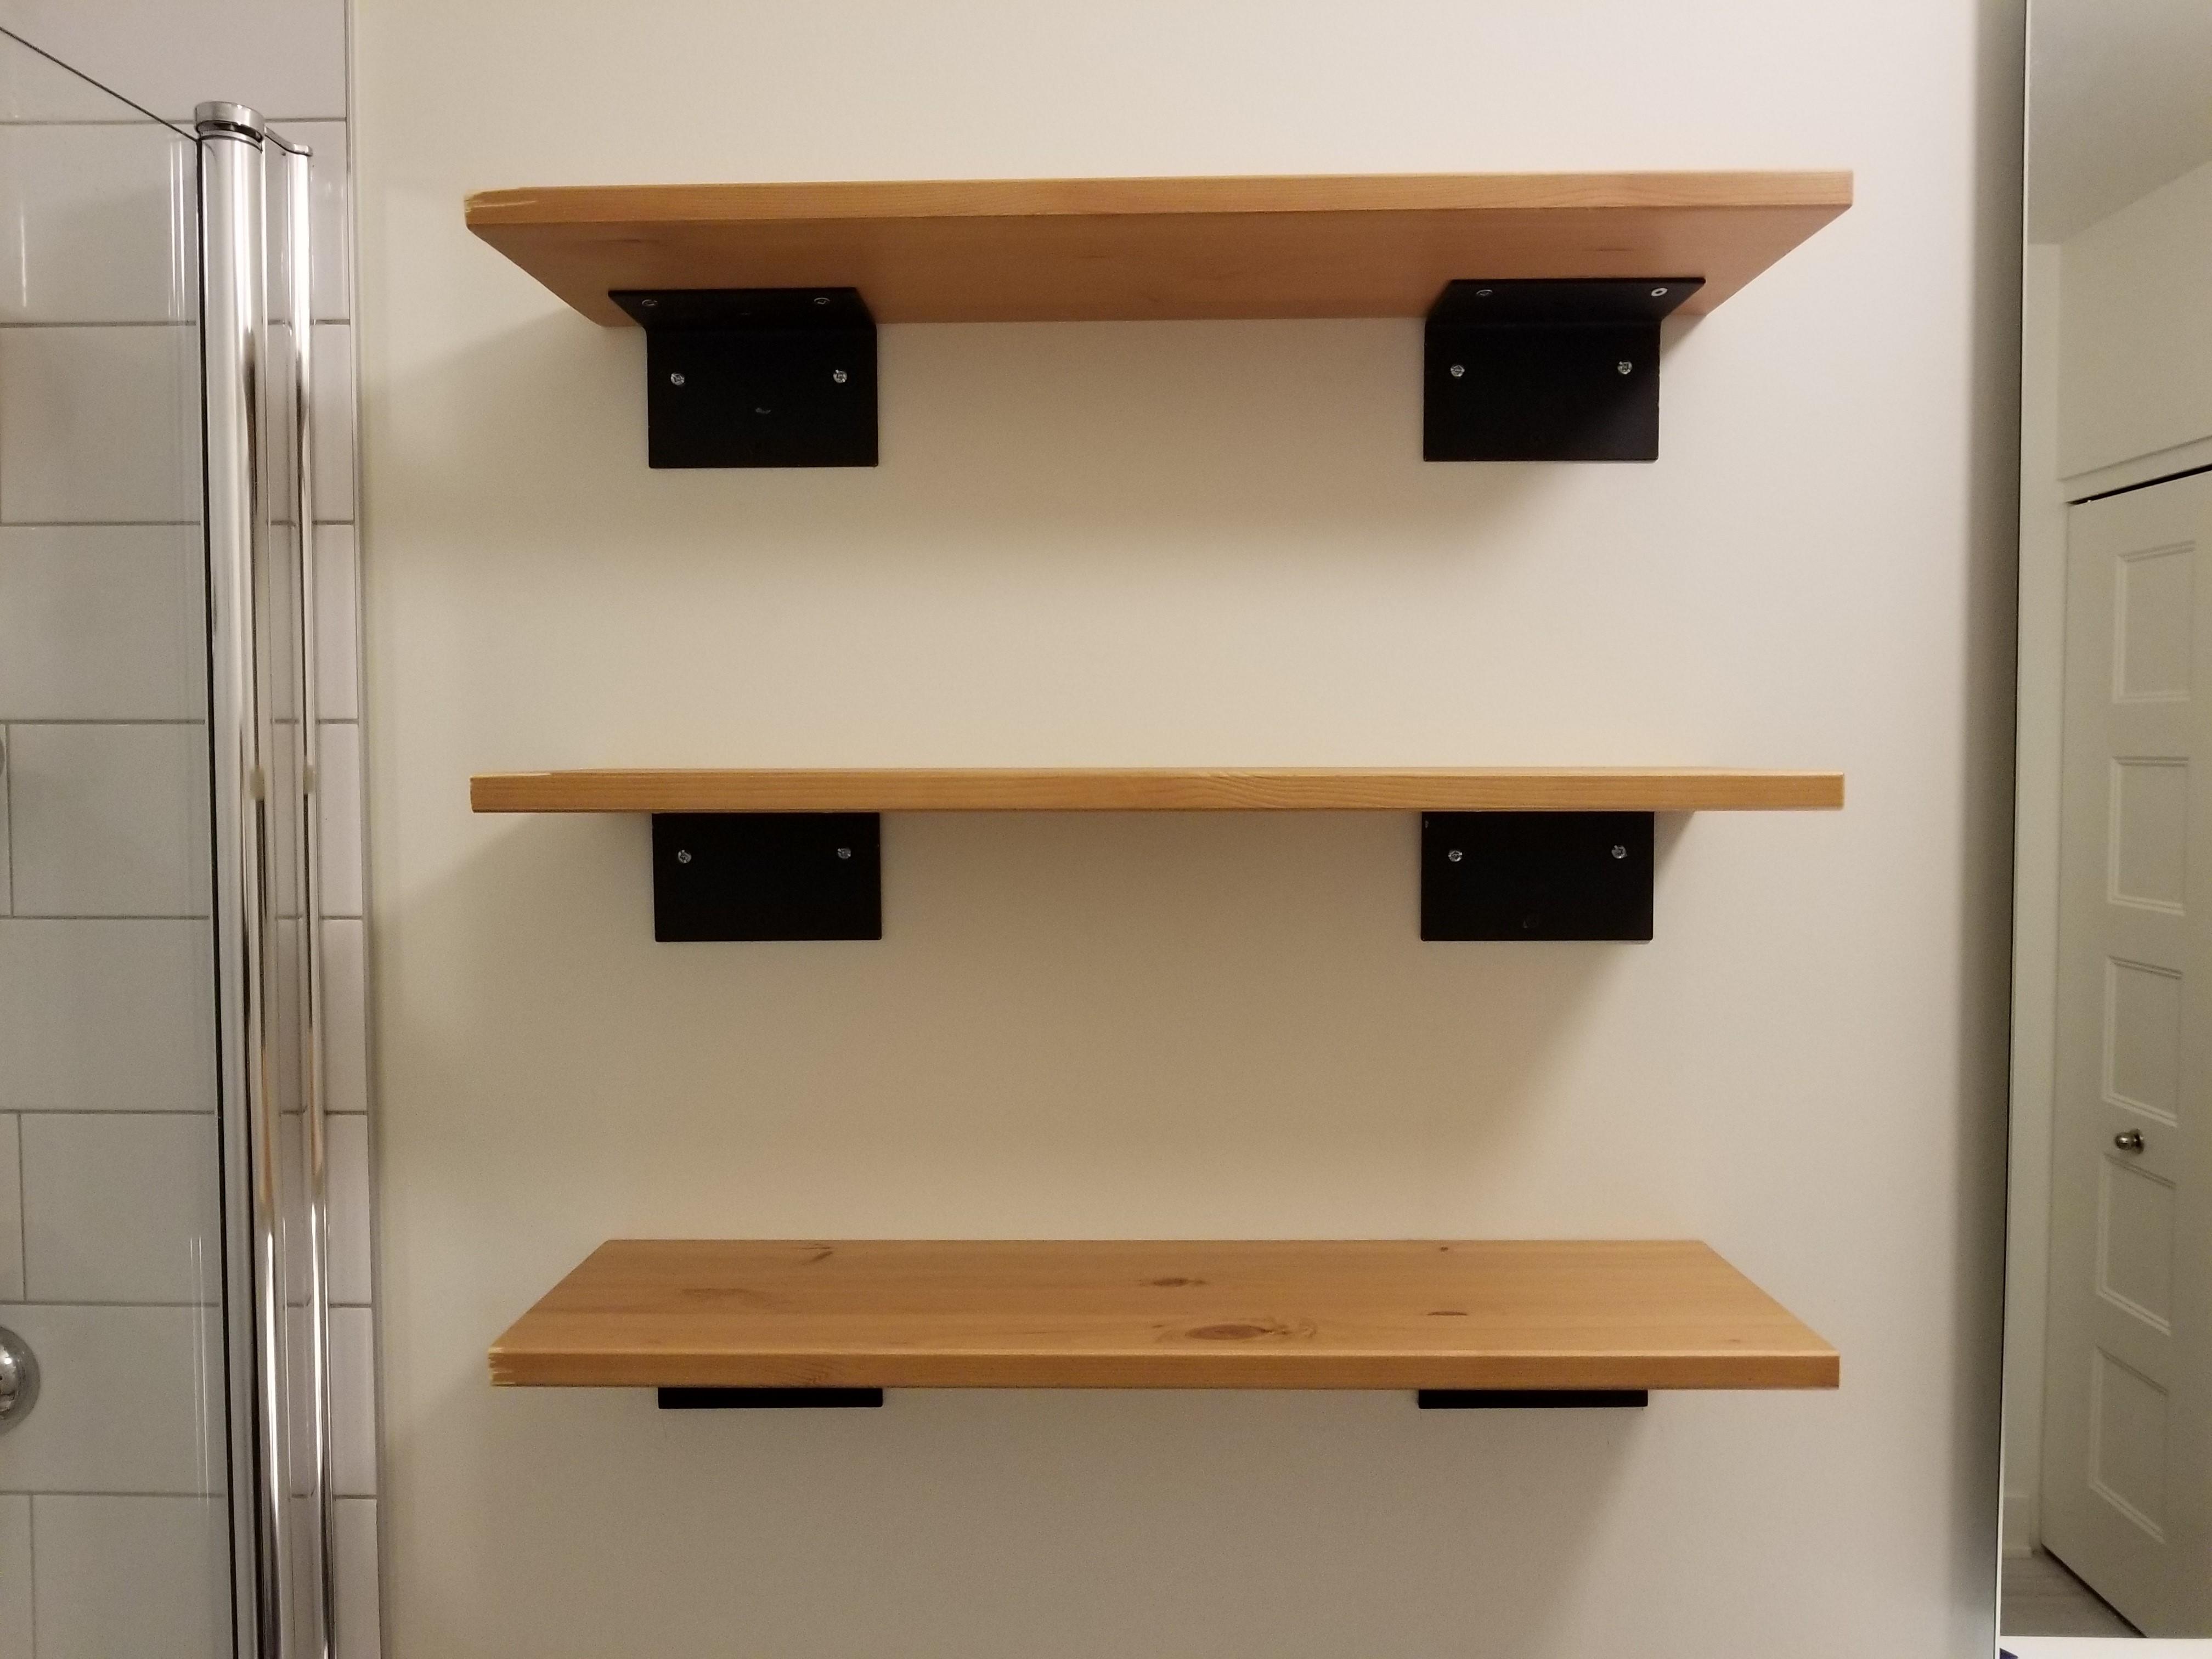 Ikea Wall Shelves How To Hang Shelves In 3 Easy Steps